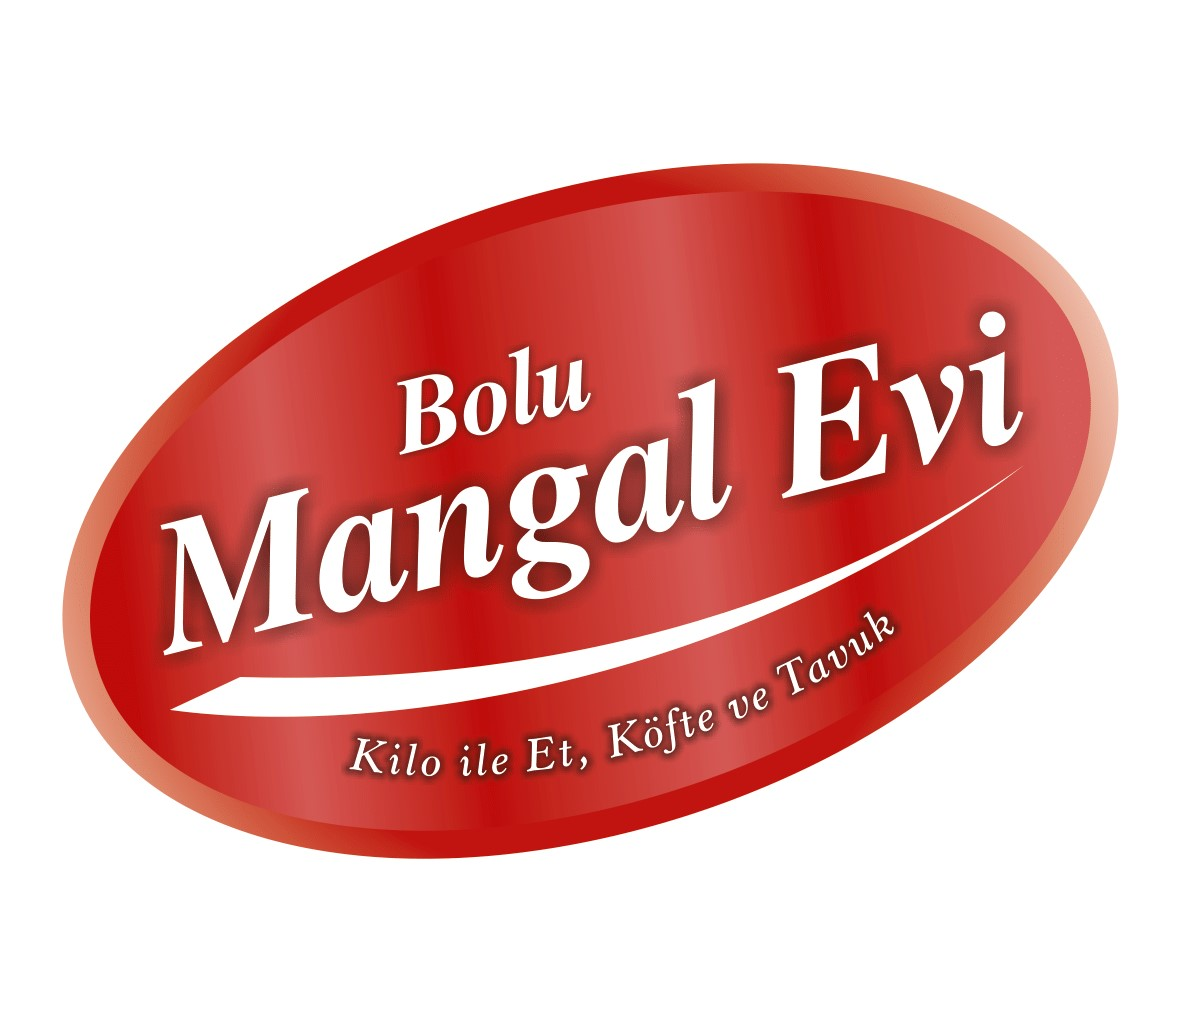 Bolu Mangal Evi